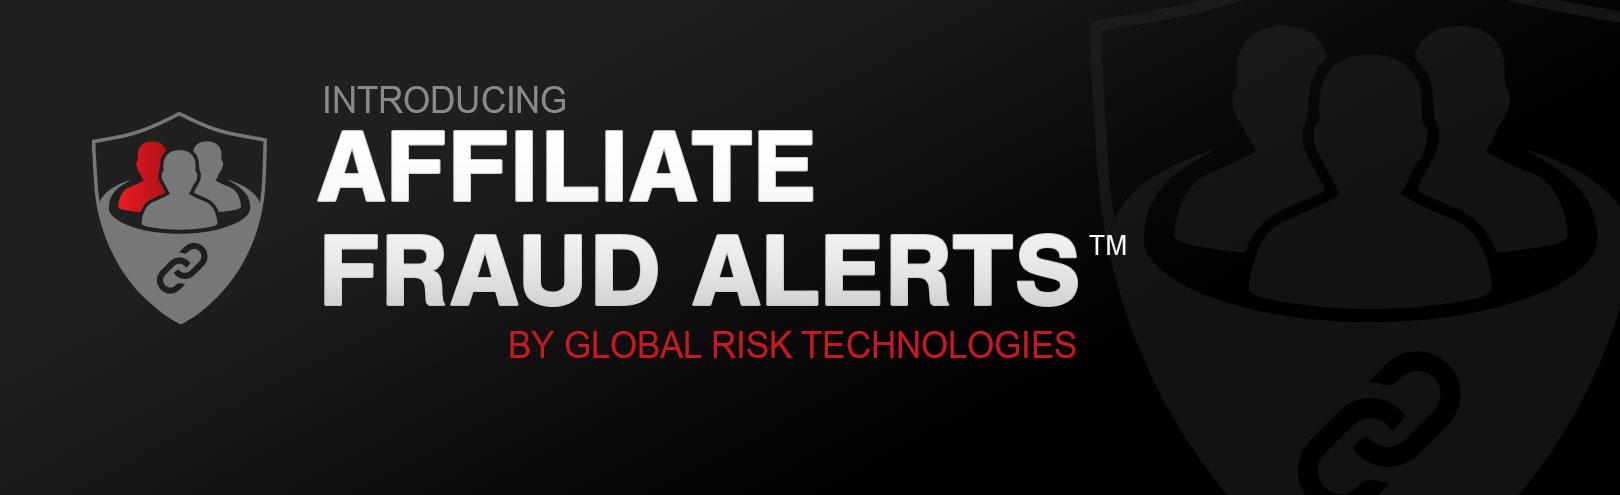 Affiliate-fraud-alerts